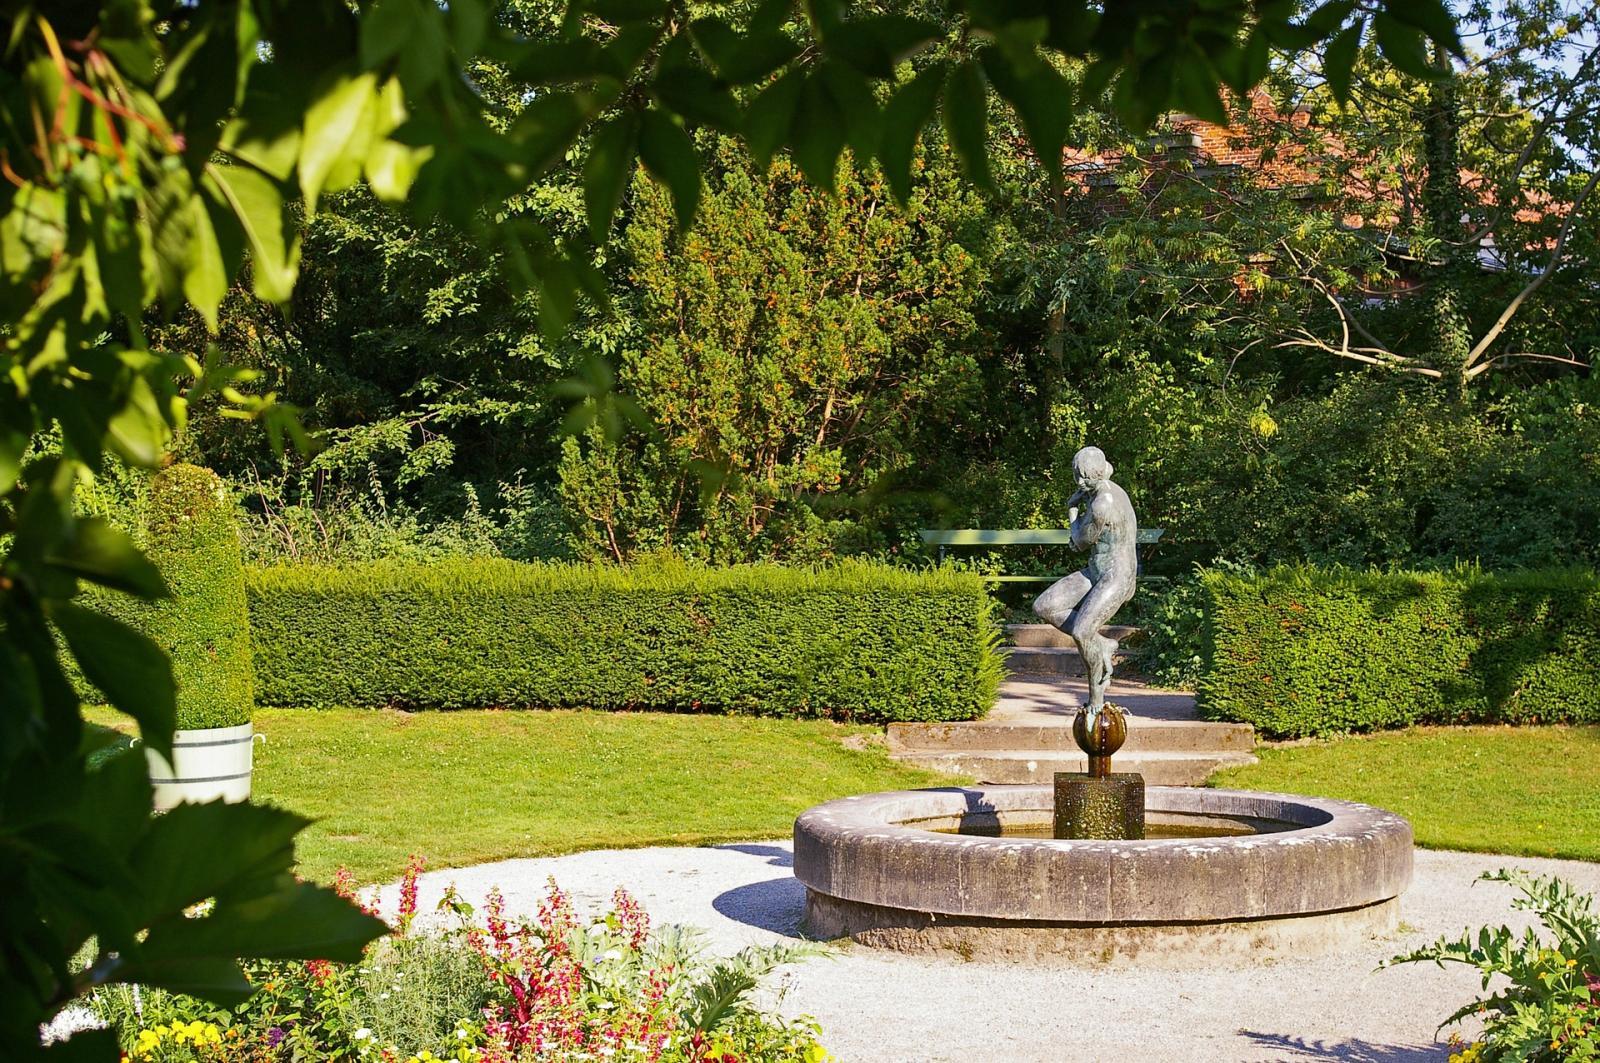 in-the-new-garden-3666715_1920